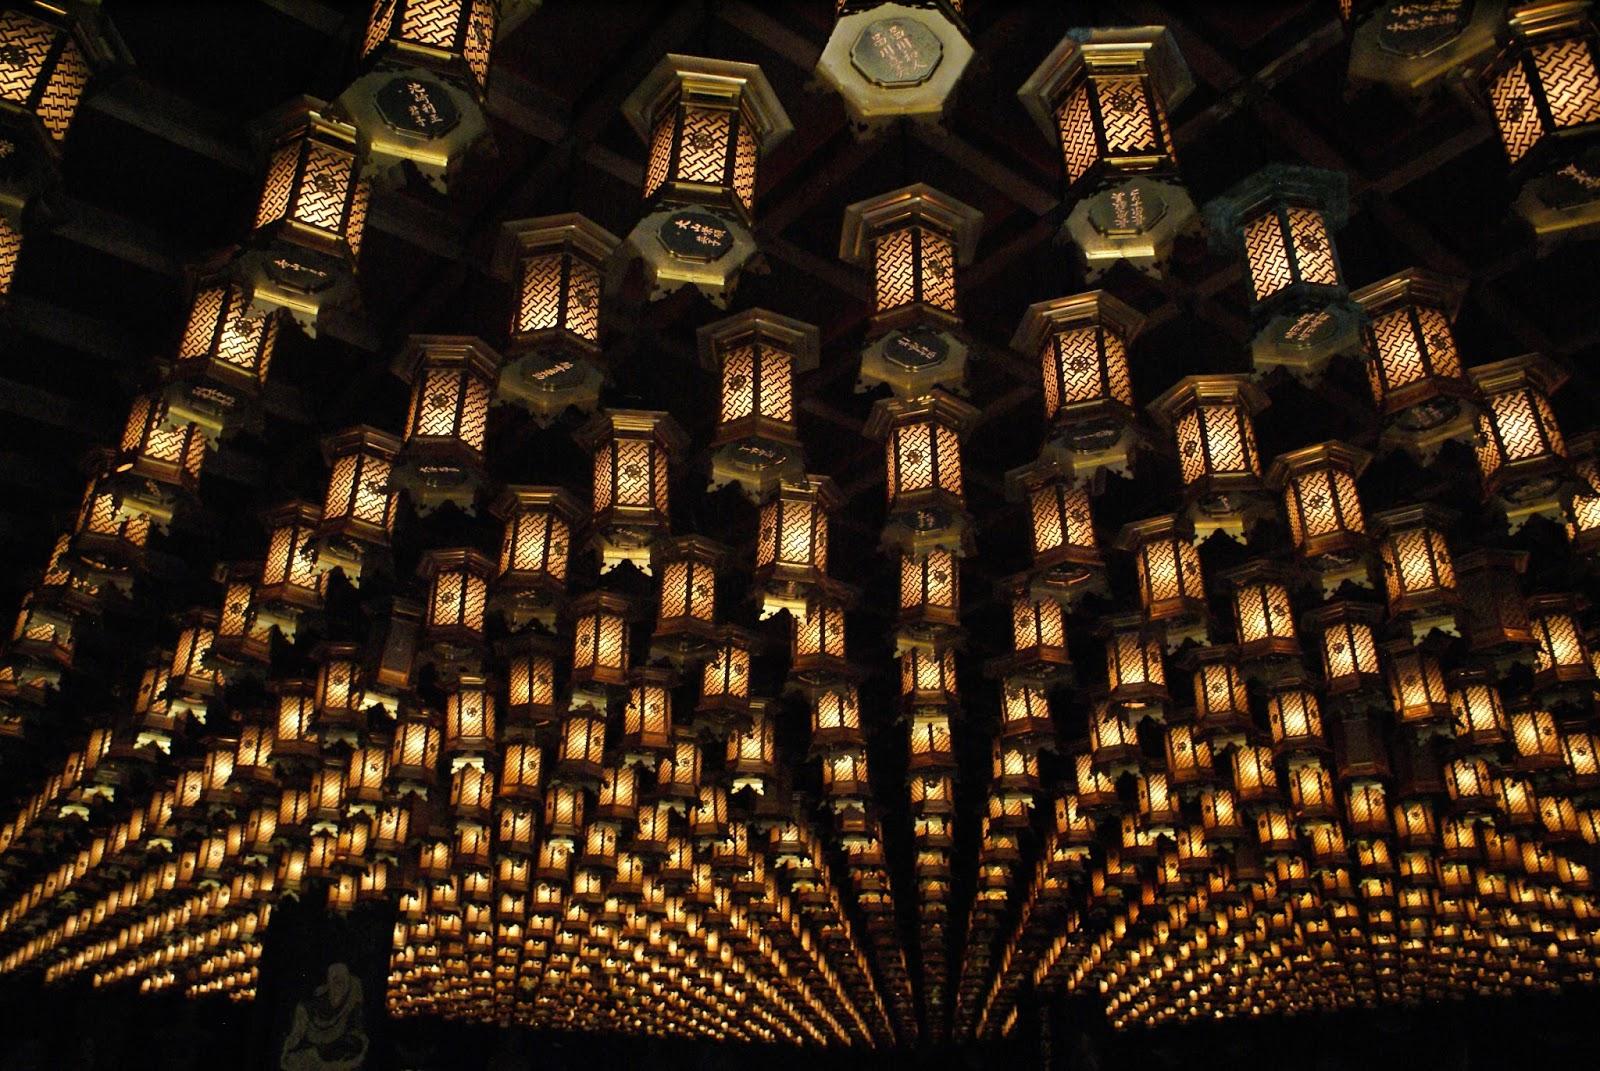 daisho-in buddhist temple japan miyajima lantern itsukushima henjokutsu